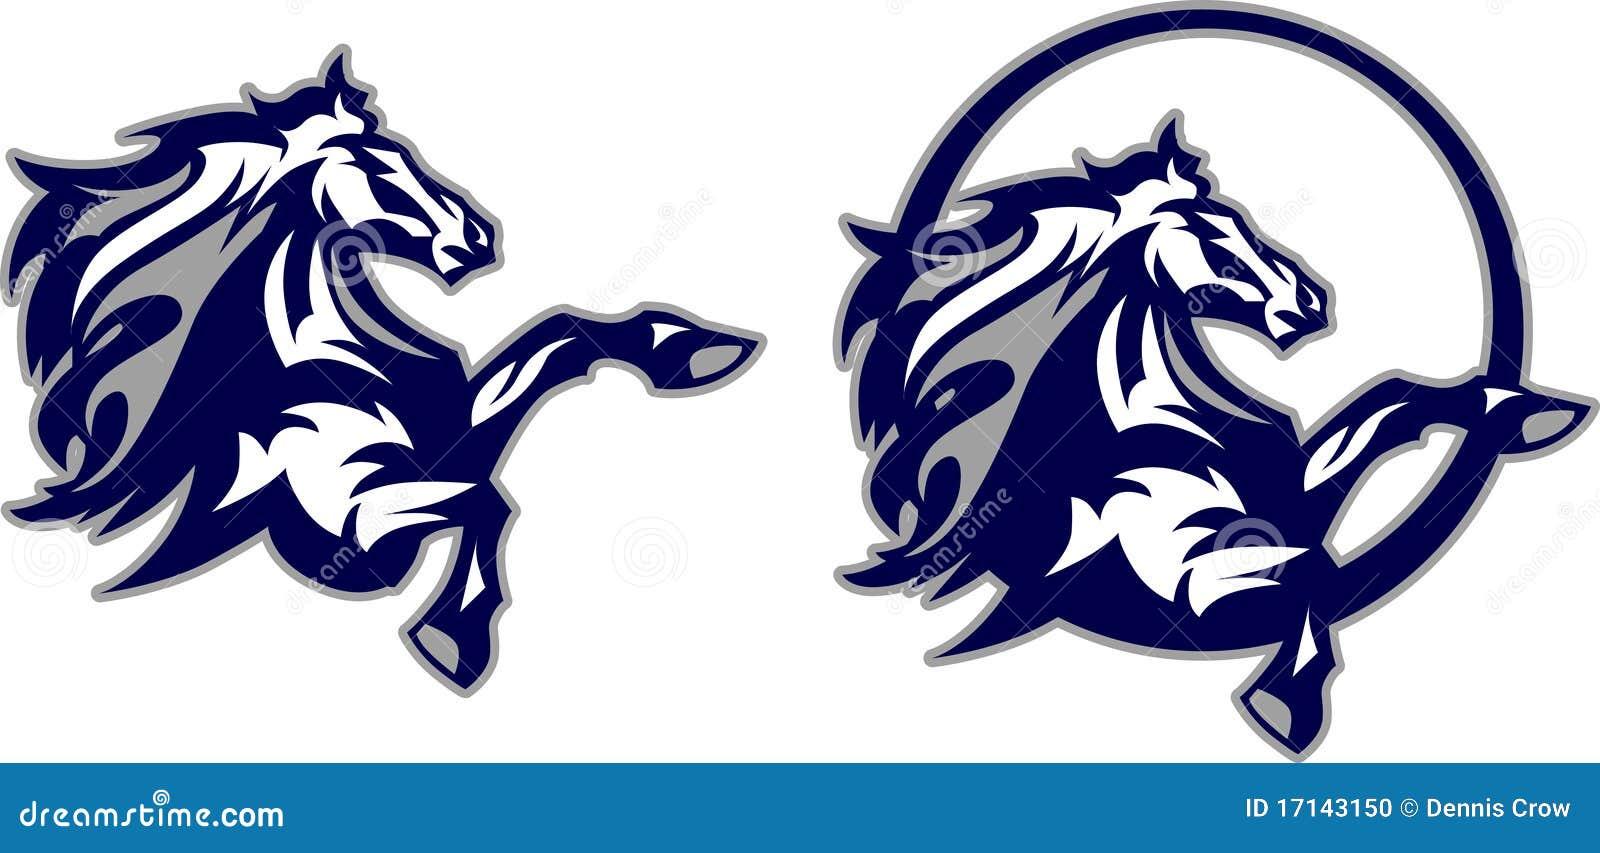 Horse / Mustang / Bronco Mascot Logo